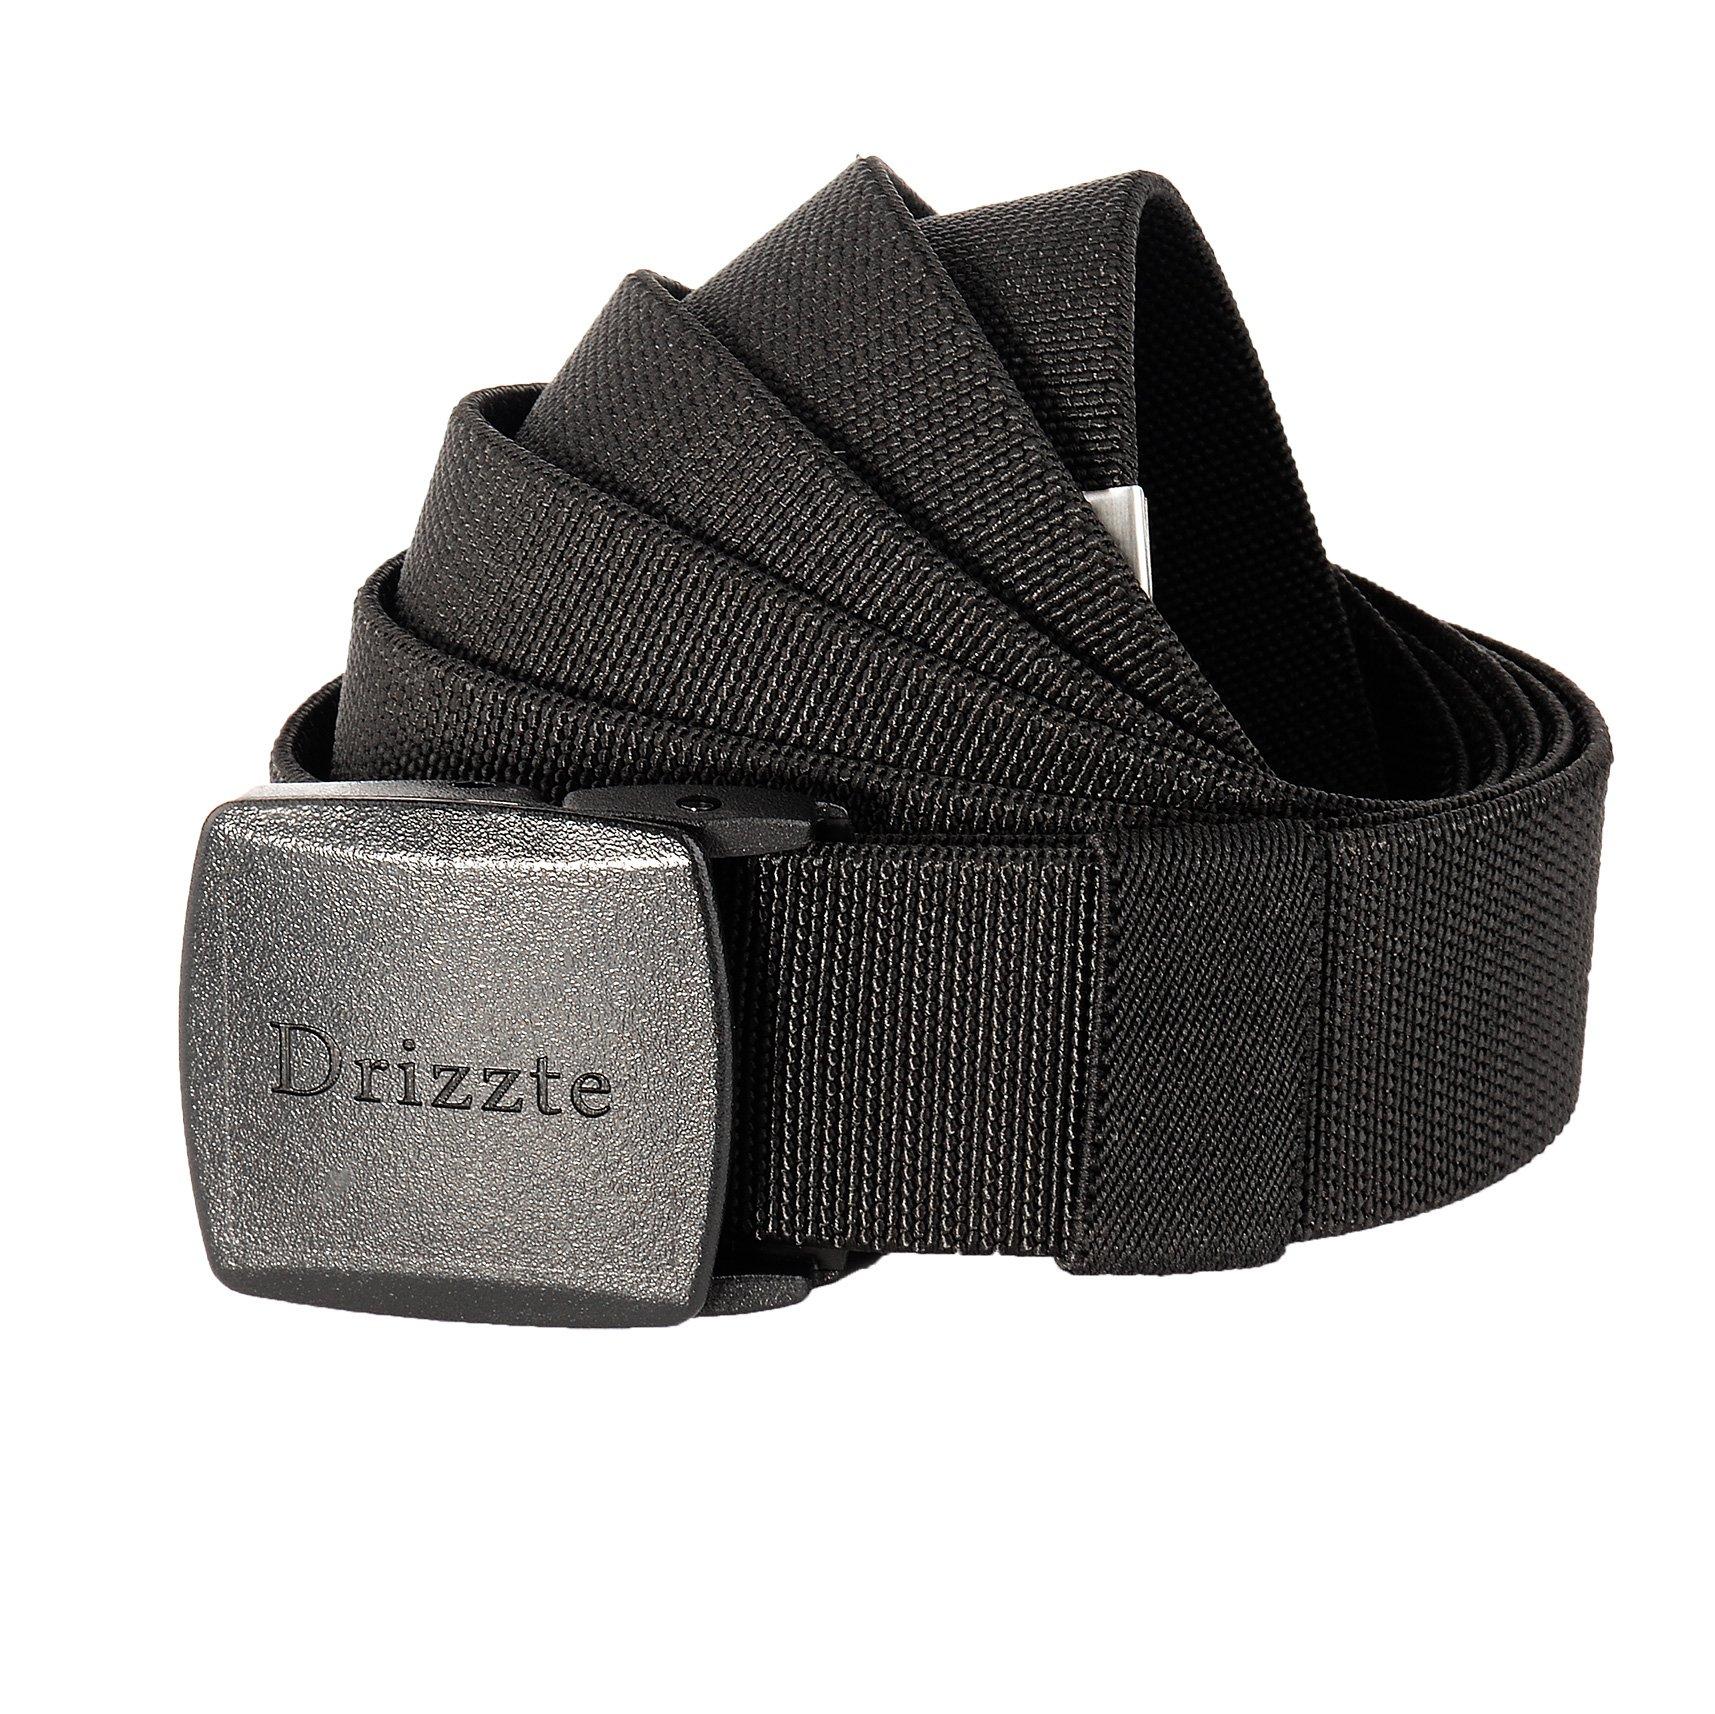 Drizzte 71'' Plus Size Elastic Stretch Adjustable Dress Belt Plastic Buckle Black